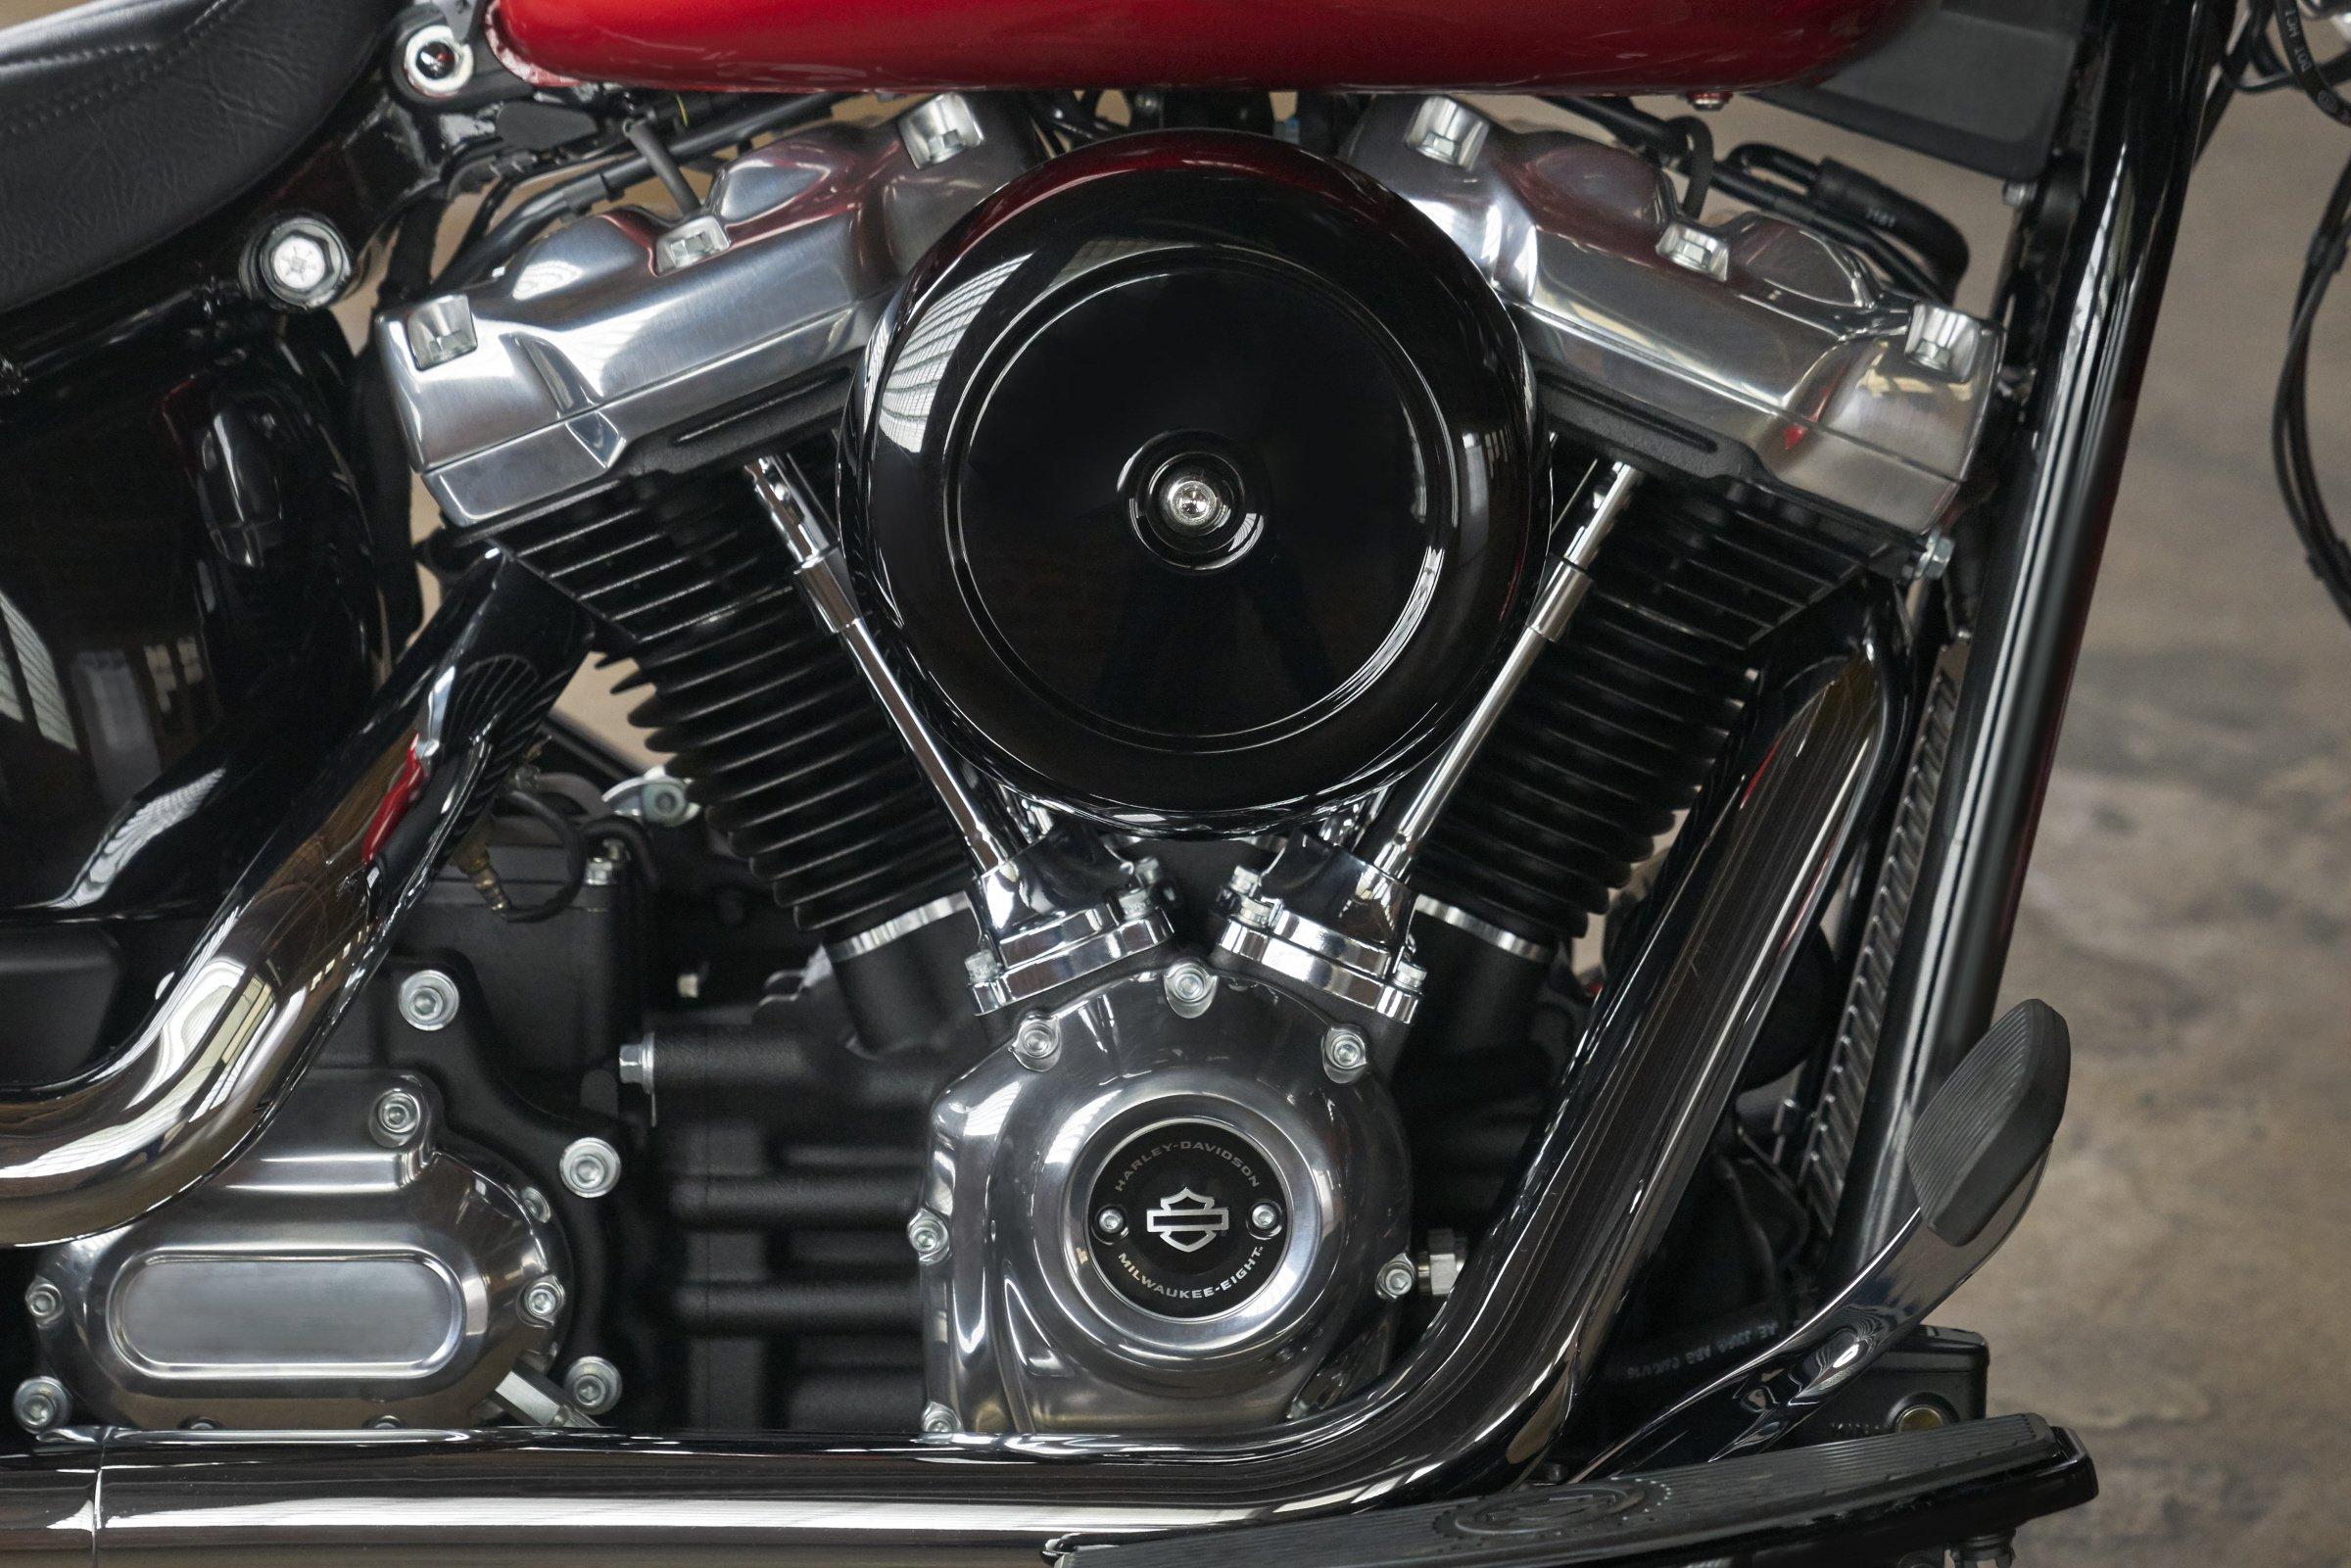 Harley Davidson: 2018 Harley-Davidson Softail Range Updated